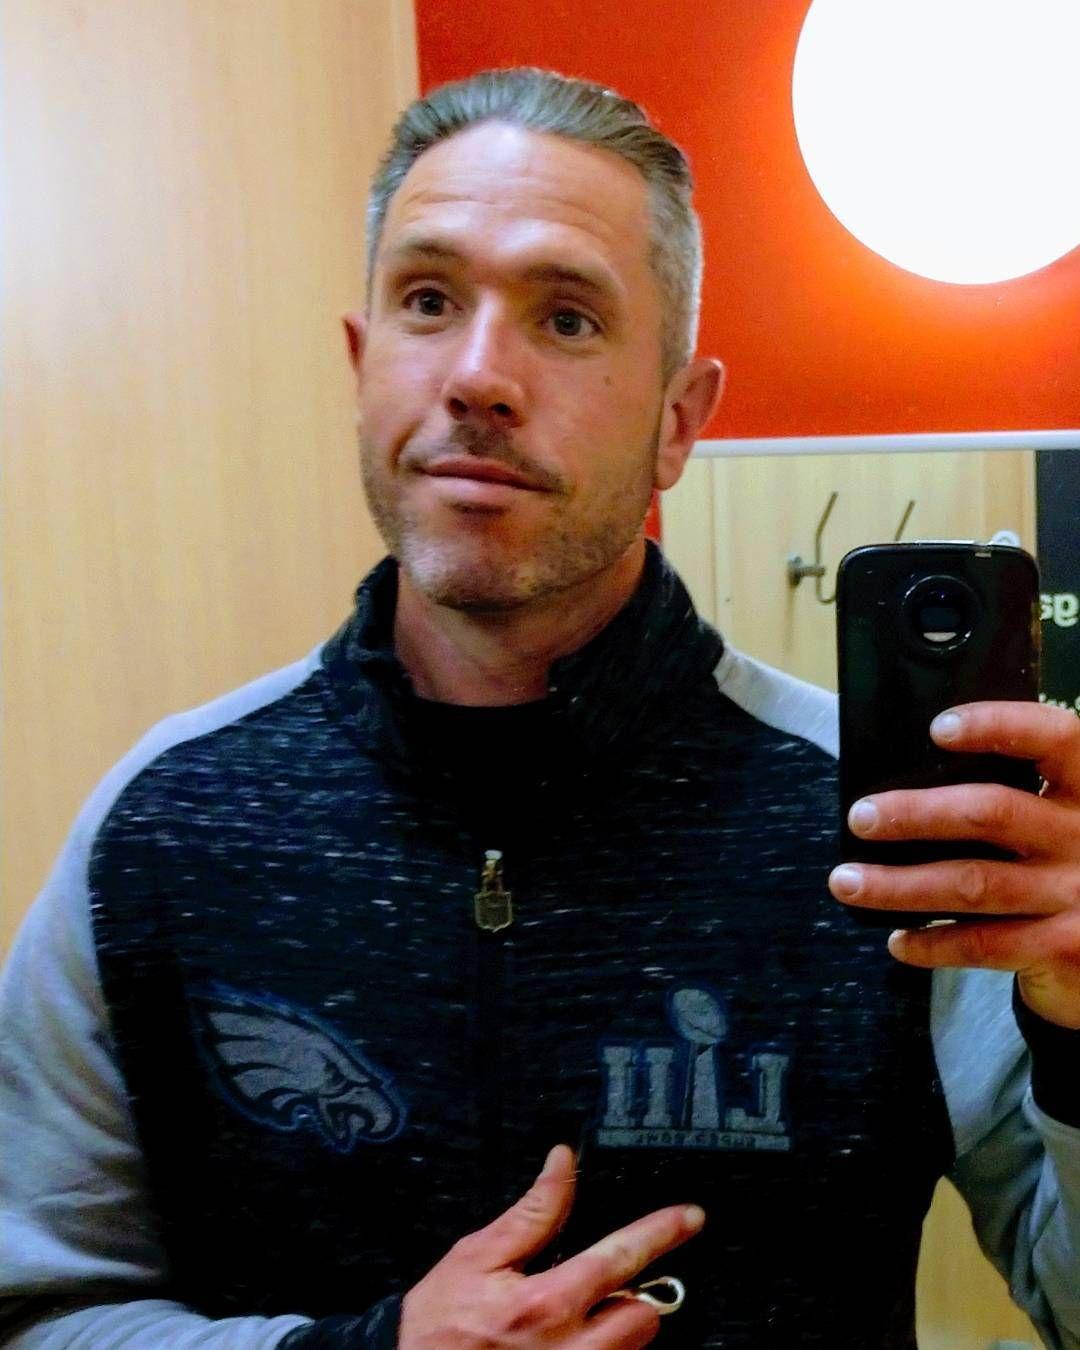 b1fba50d Super Bowl T Shirts Target « Alzheimer's Network of Oregon